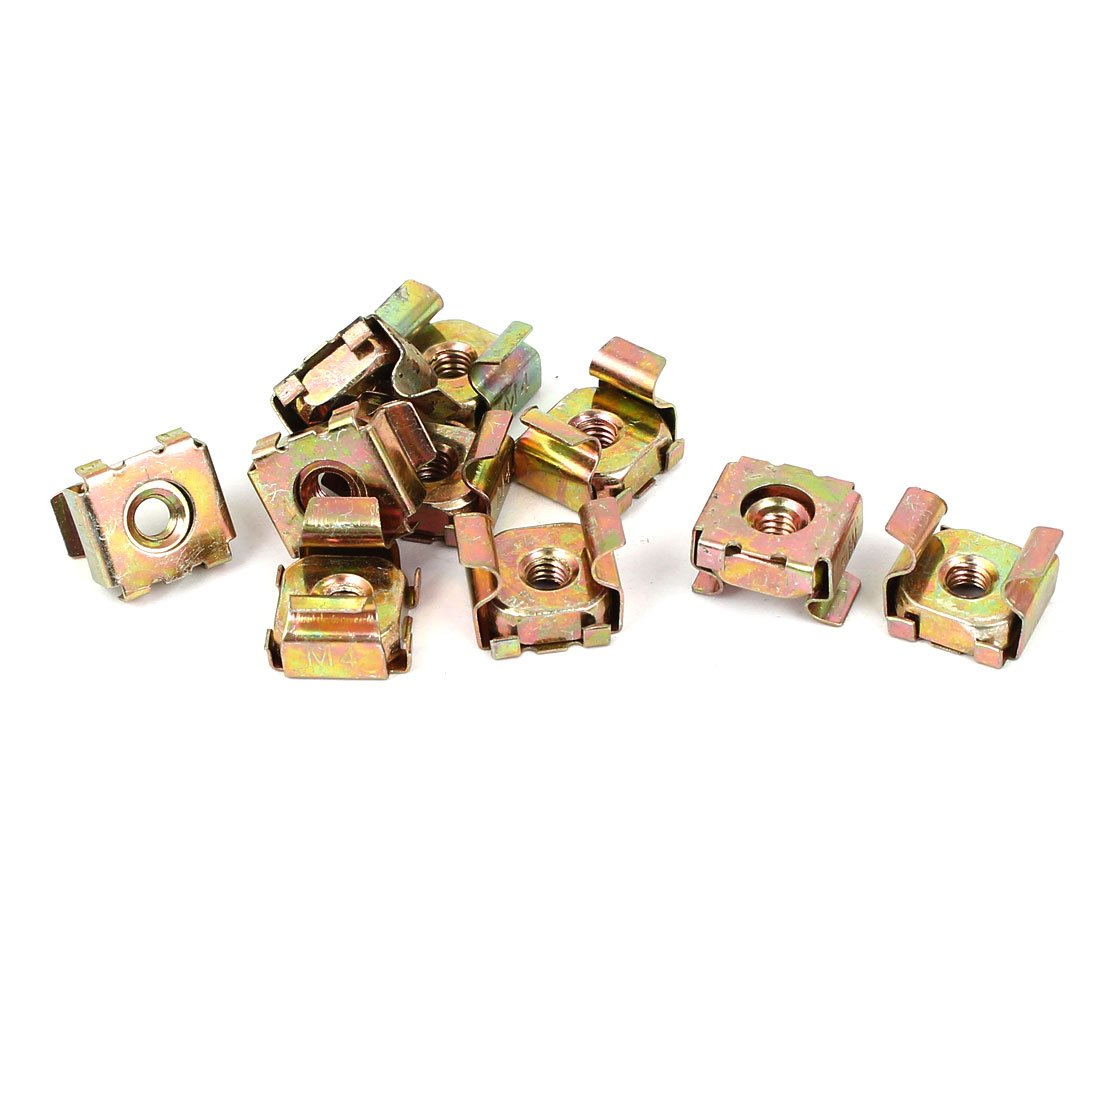 Nuts Square Square Zinc M4 X 0.7-24560140